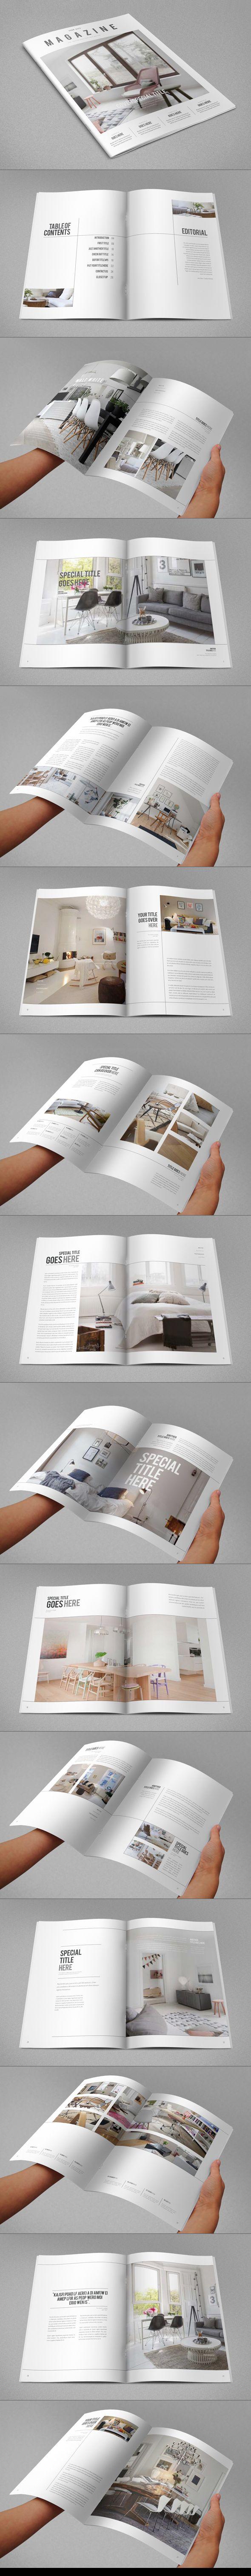 Minimal Interior Design Magazine. Download here: http://graphicriver.net/item/minimal-interior-design-magazine/9499179?ref=abradesign #magazine #template #design #editorial